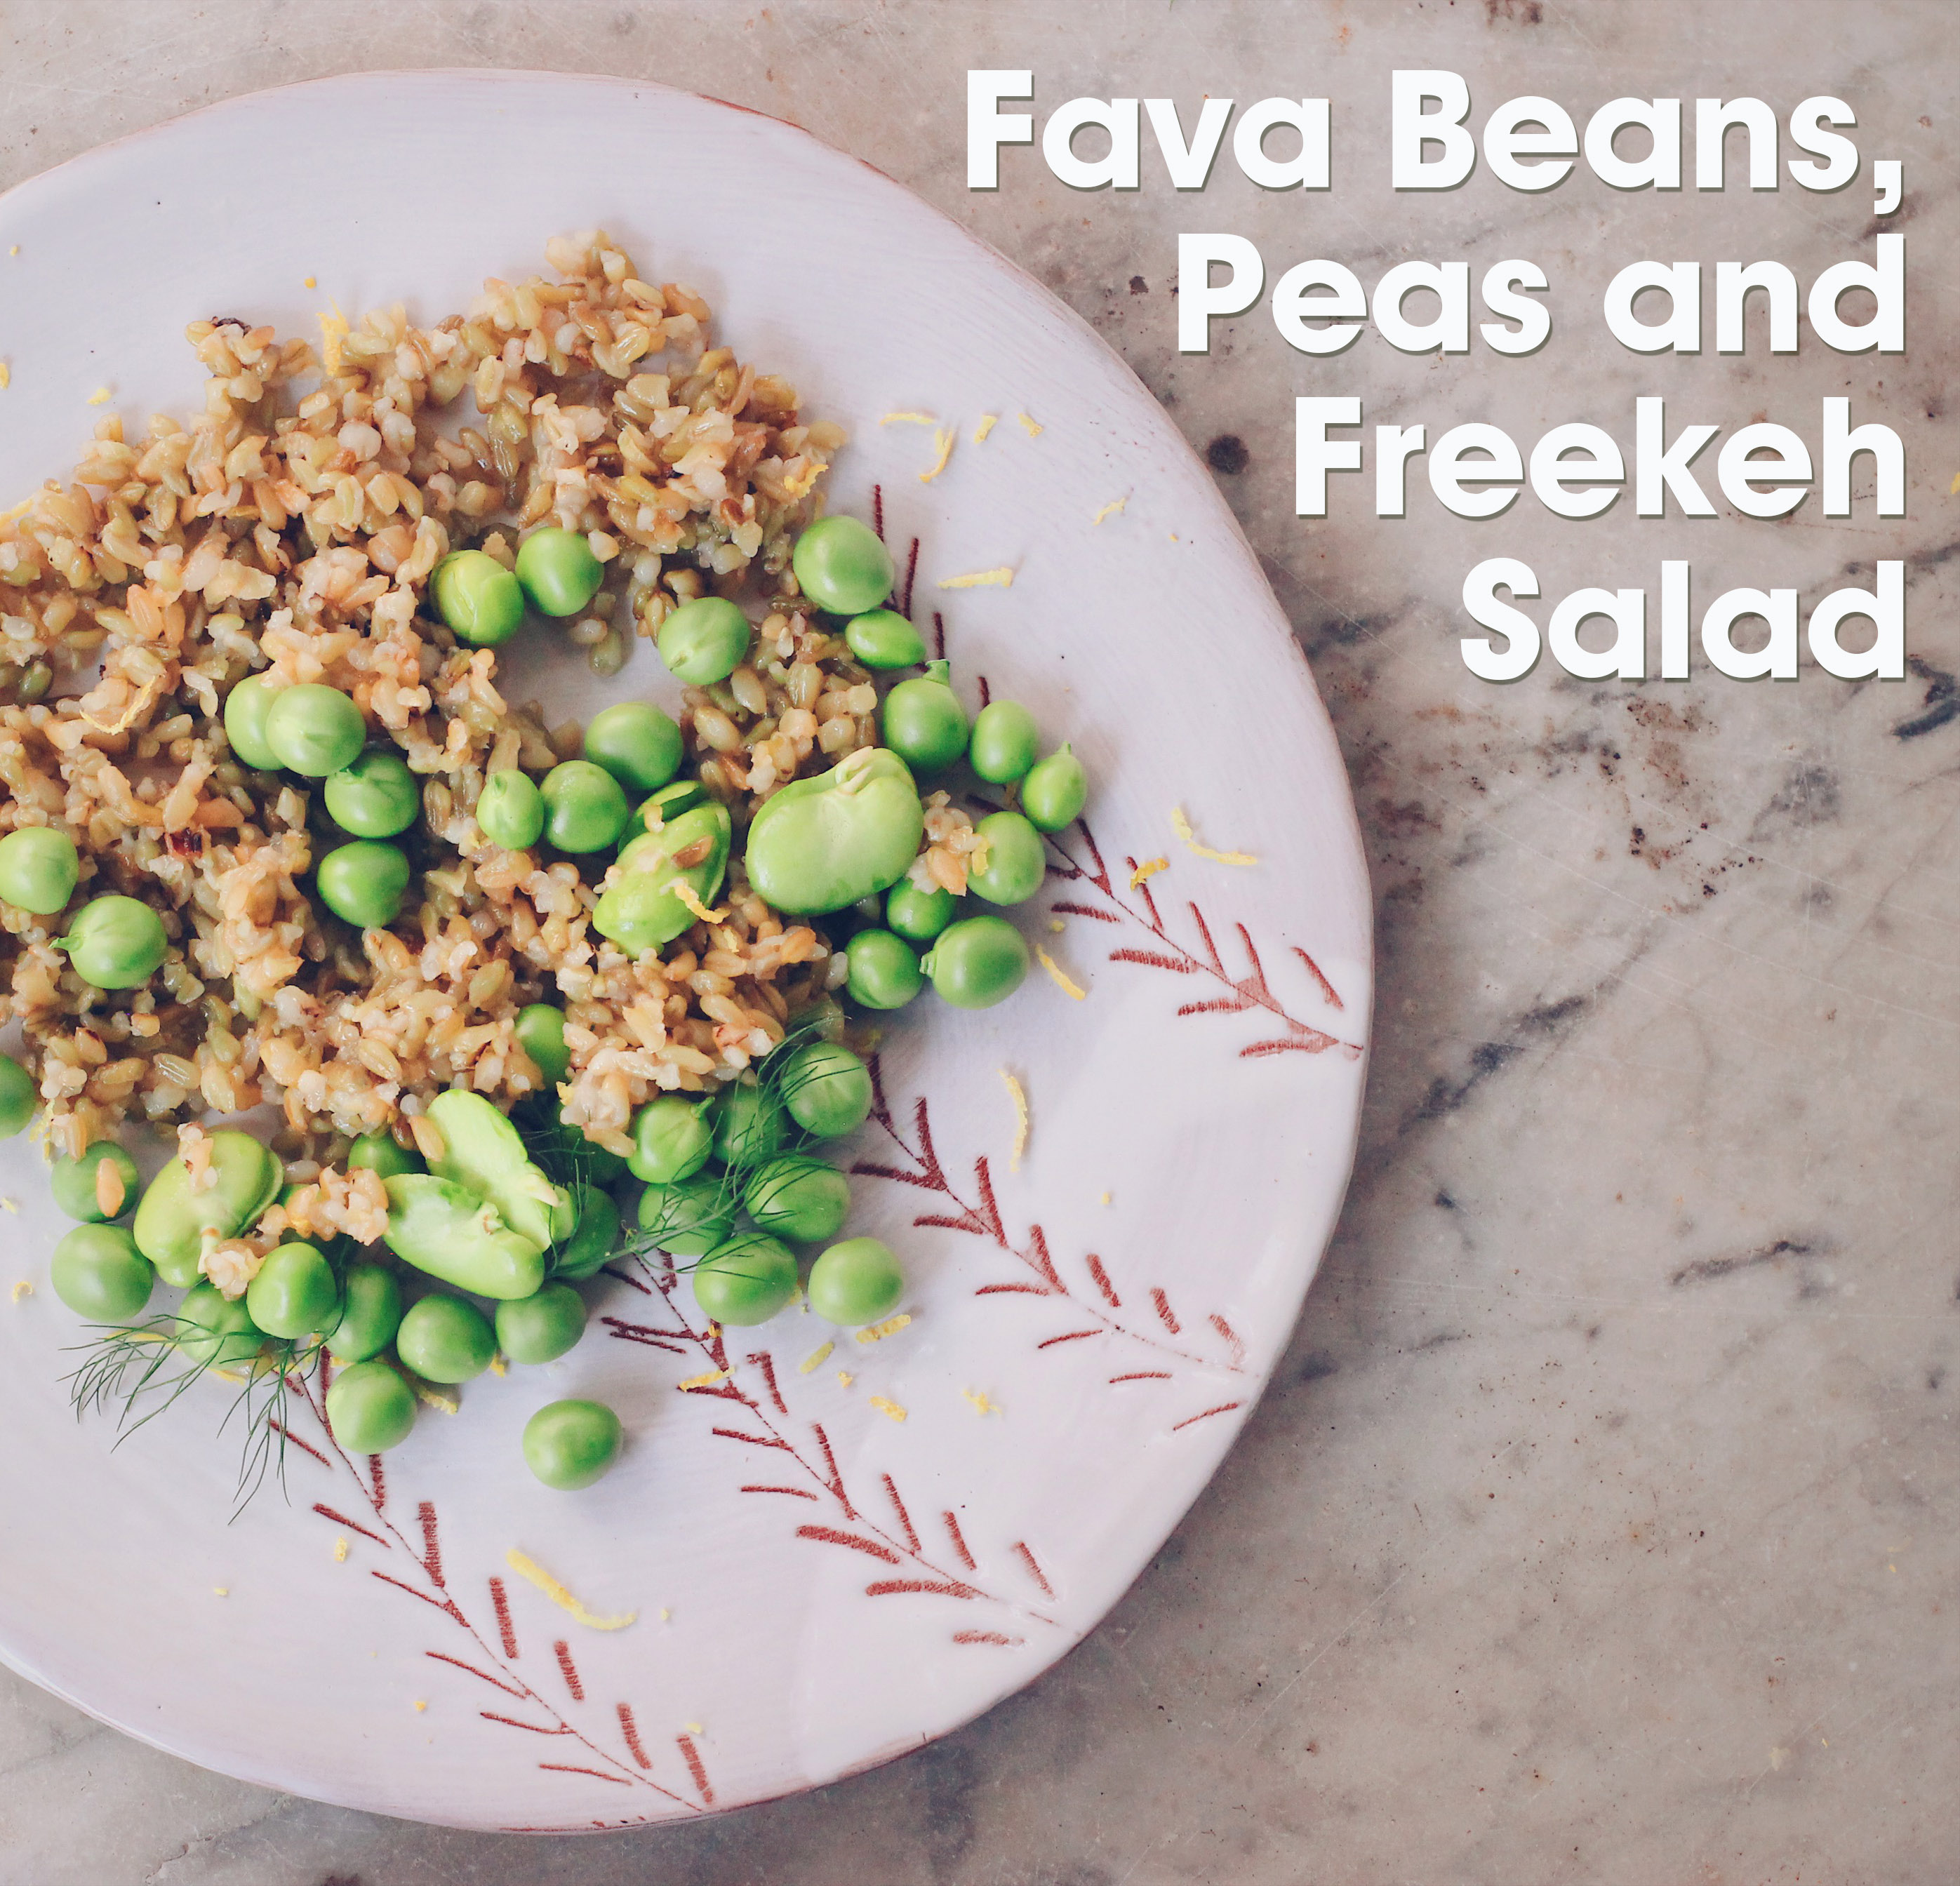 PIN-Freekeh fava beans peas salad recipe cookin5m2-4.jpg